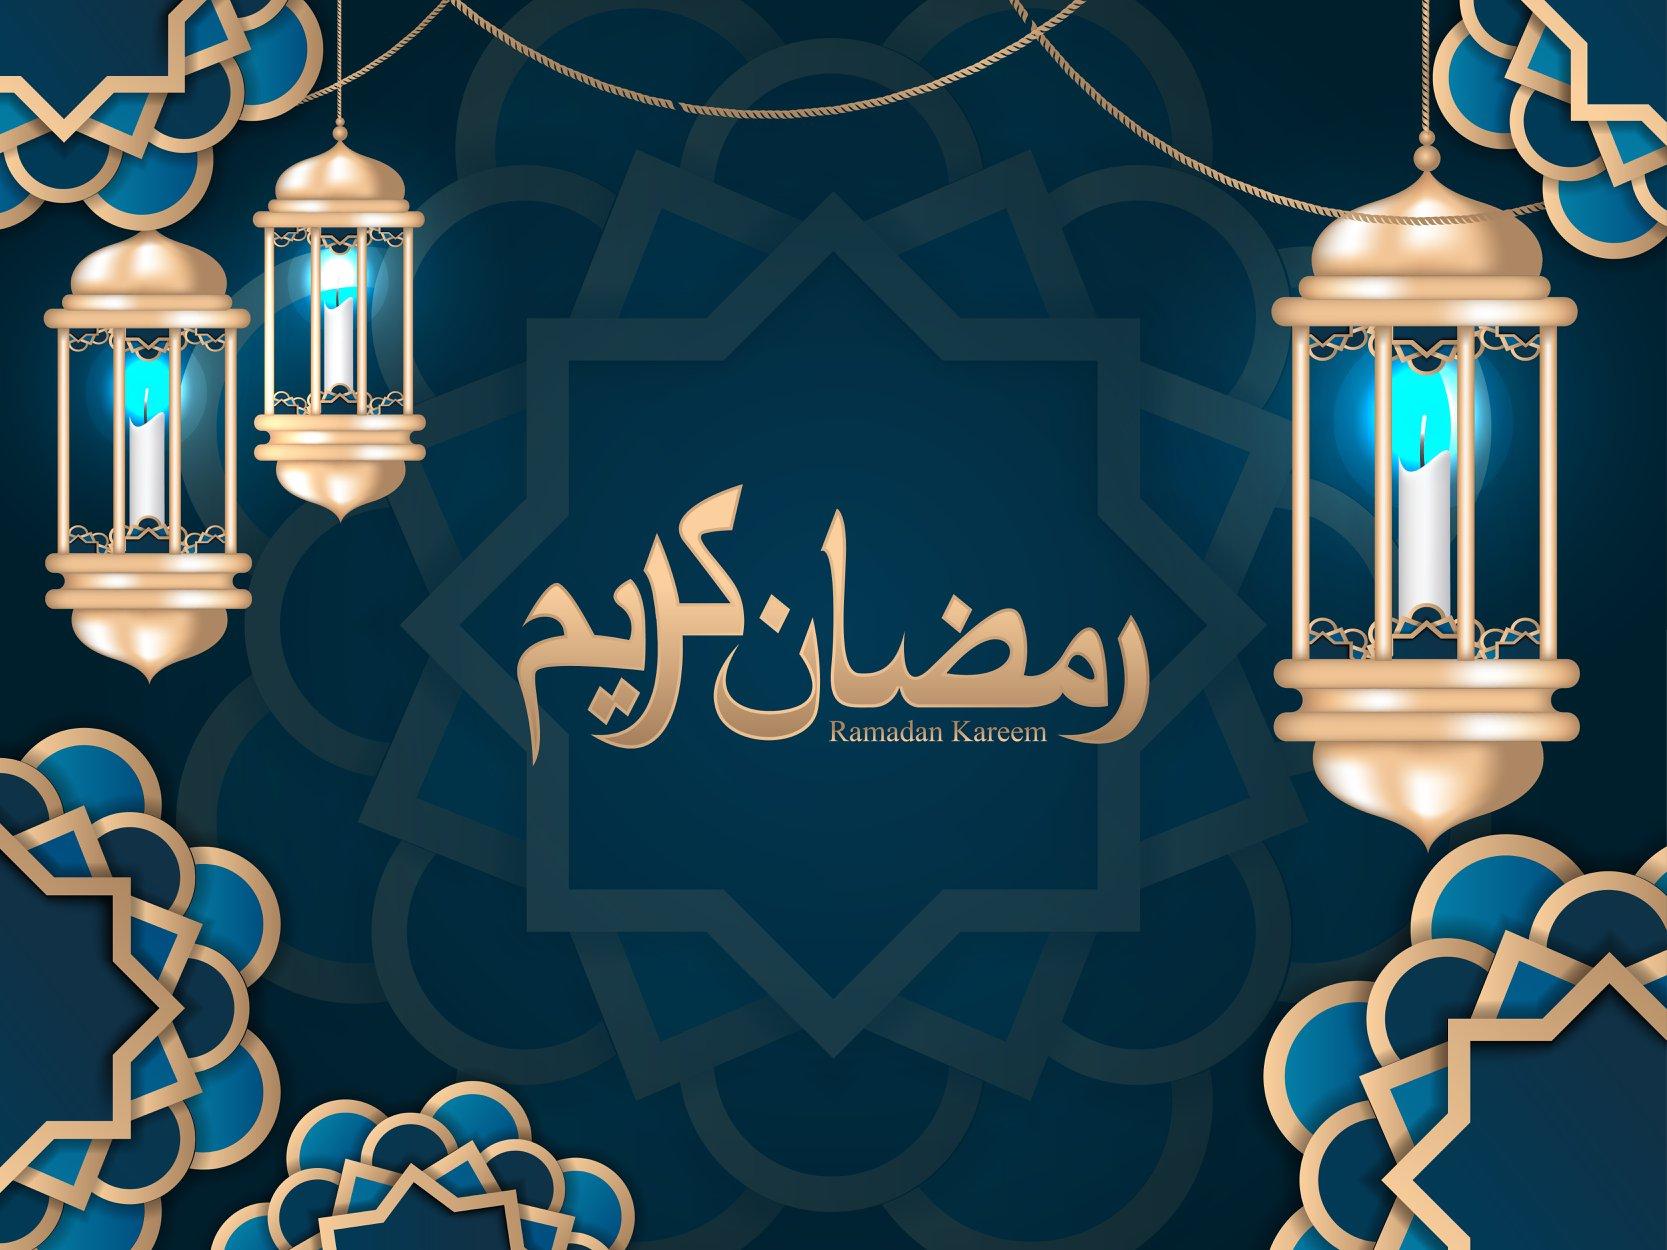 Islamic celebration background with text Ramadan Kareem 3 Islamic celebration background with text Ramadan Kareem